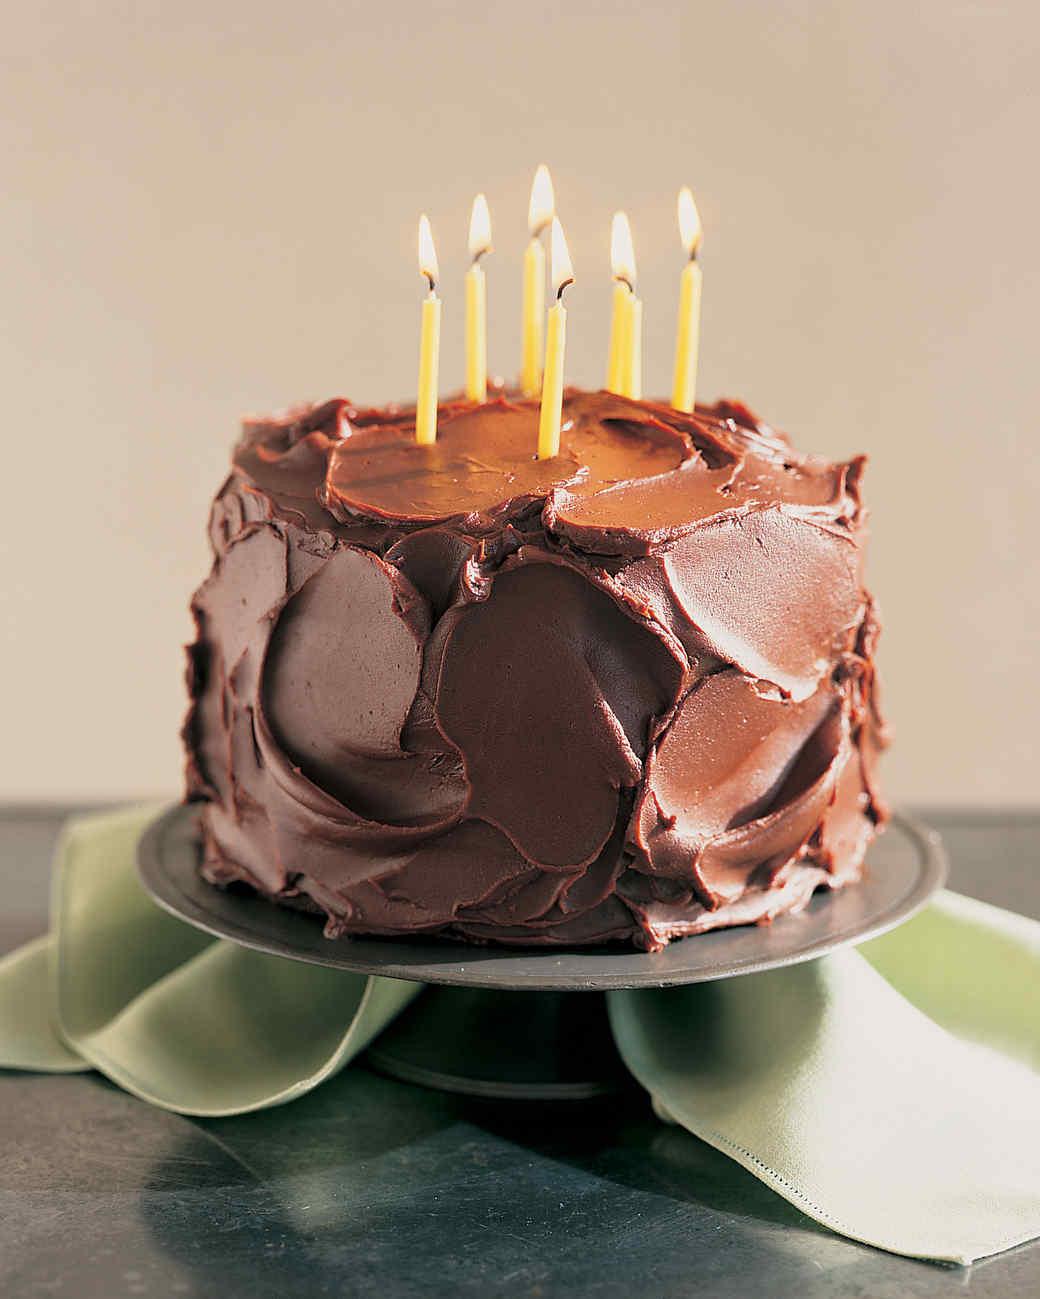 Best ideas about Chocolate Birthday Cake Recipes . Save or Pin Best Chocolate Cake Recipes Now.